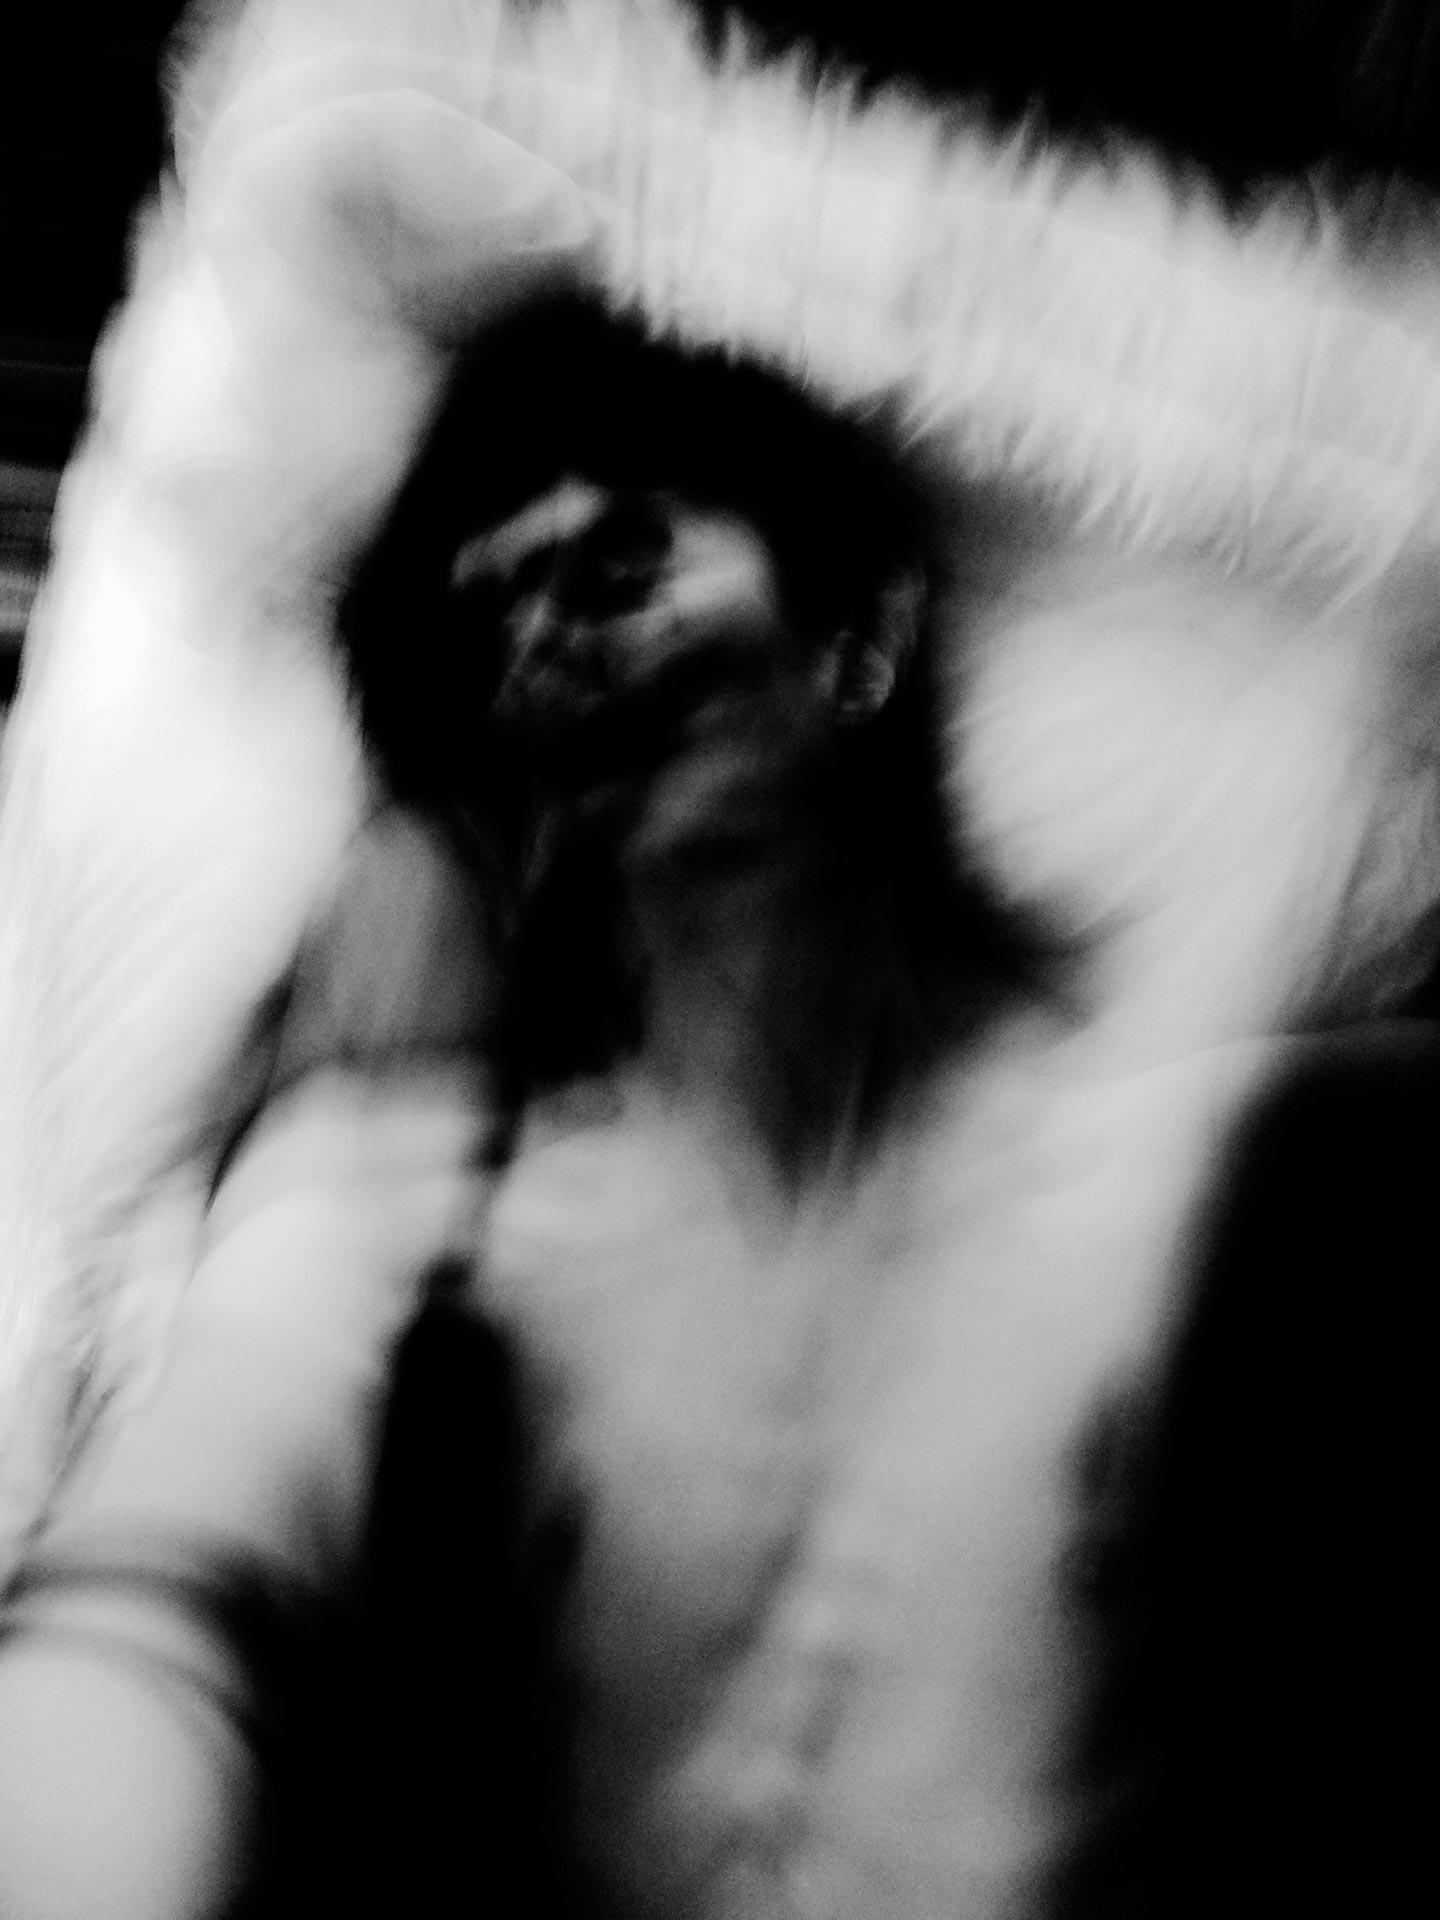 deceitful-reverence-igor-pisuk-18